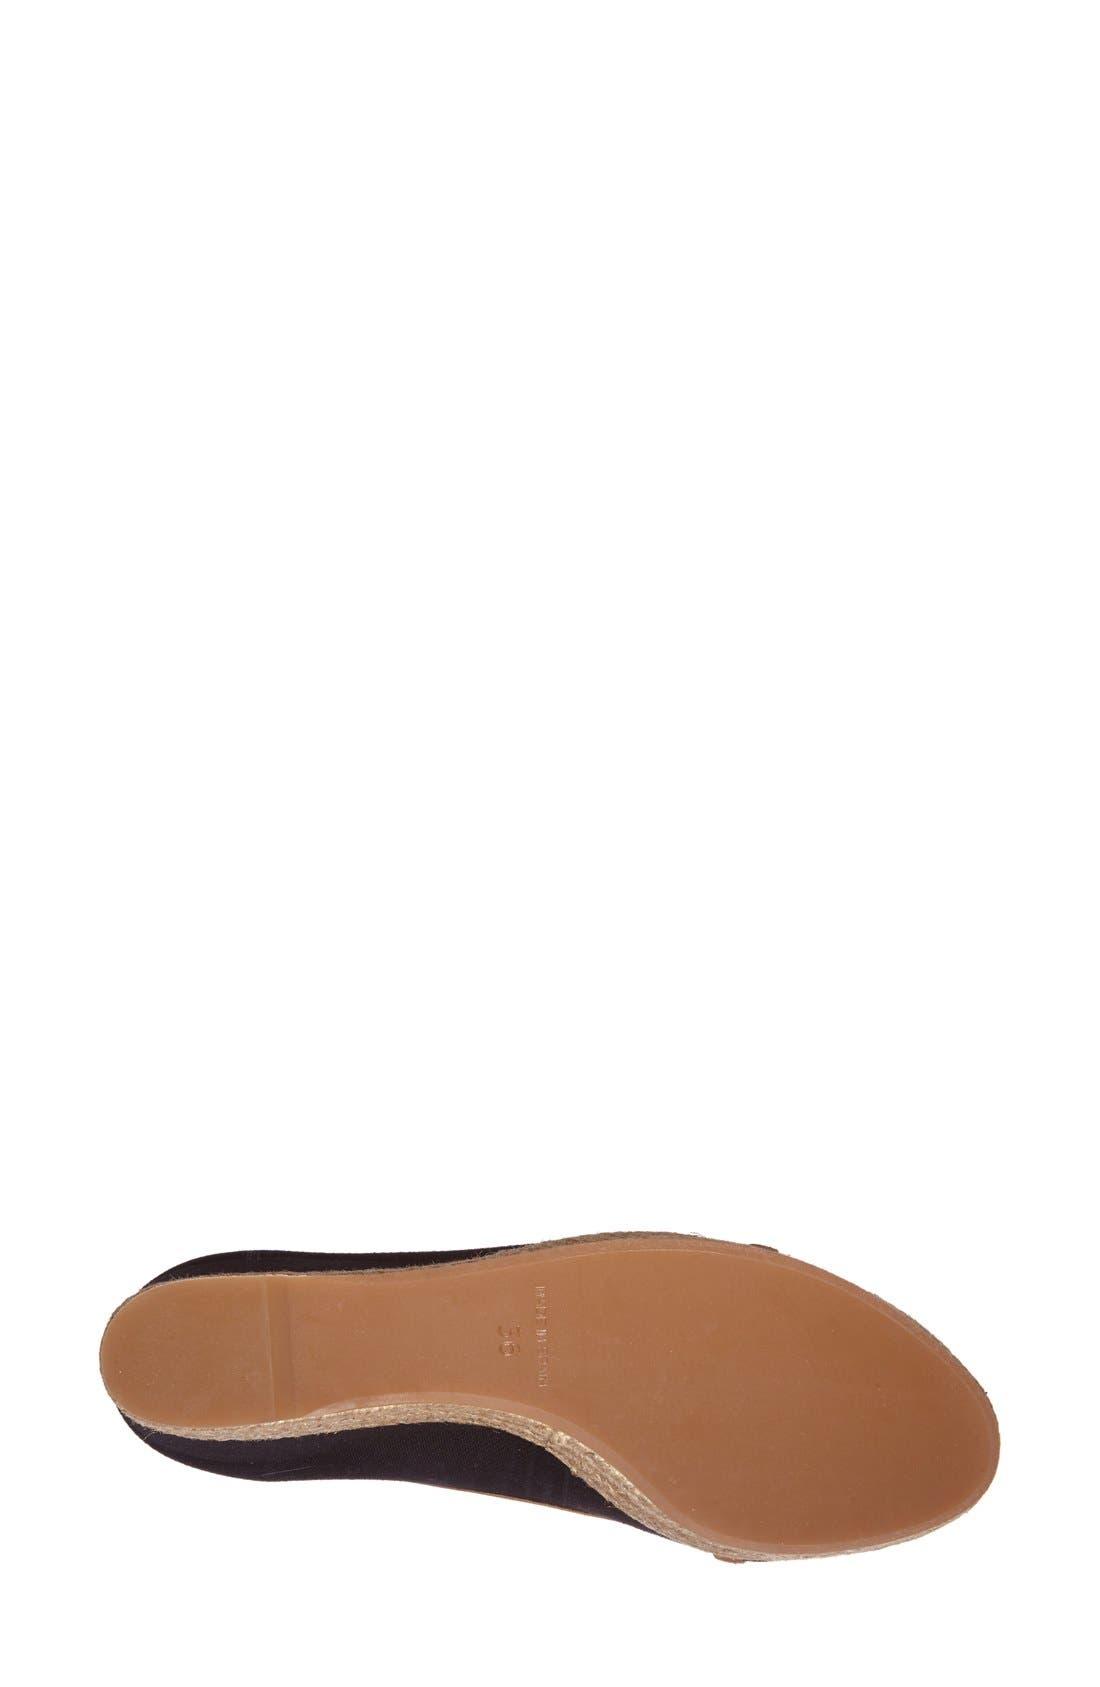 TORY BURCH,                             'Majorca' Wedge Sandal,                             Alternate thumbnail 5, color,                             013